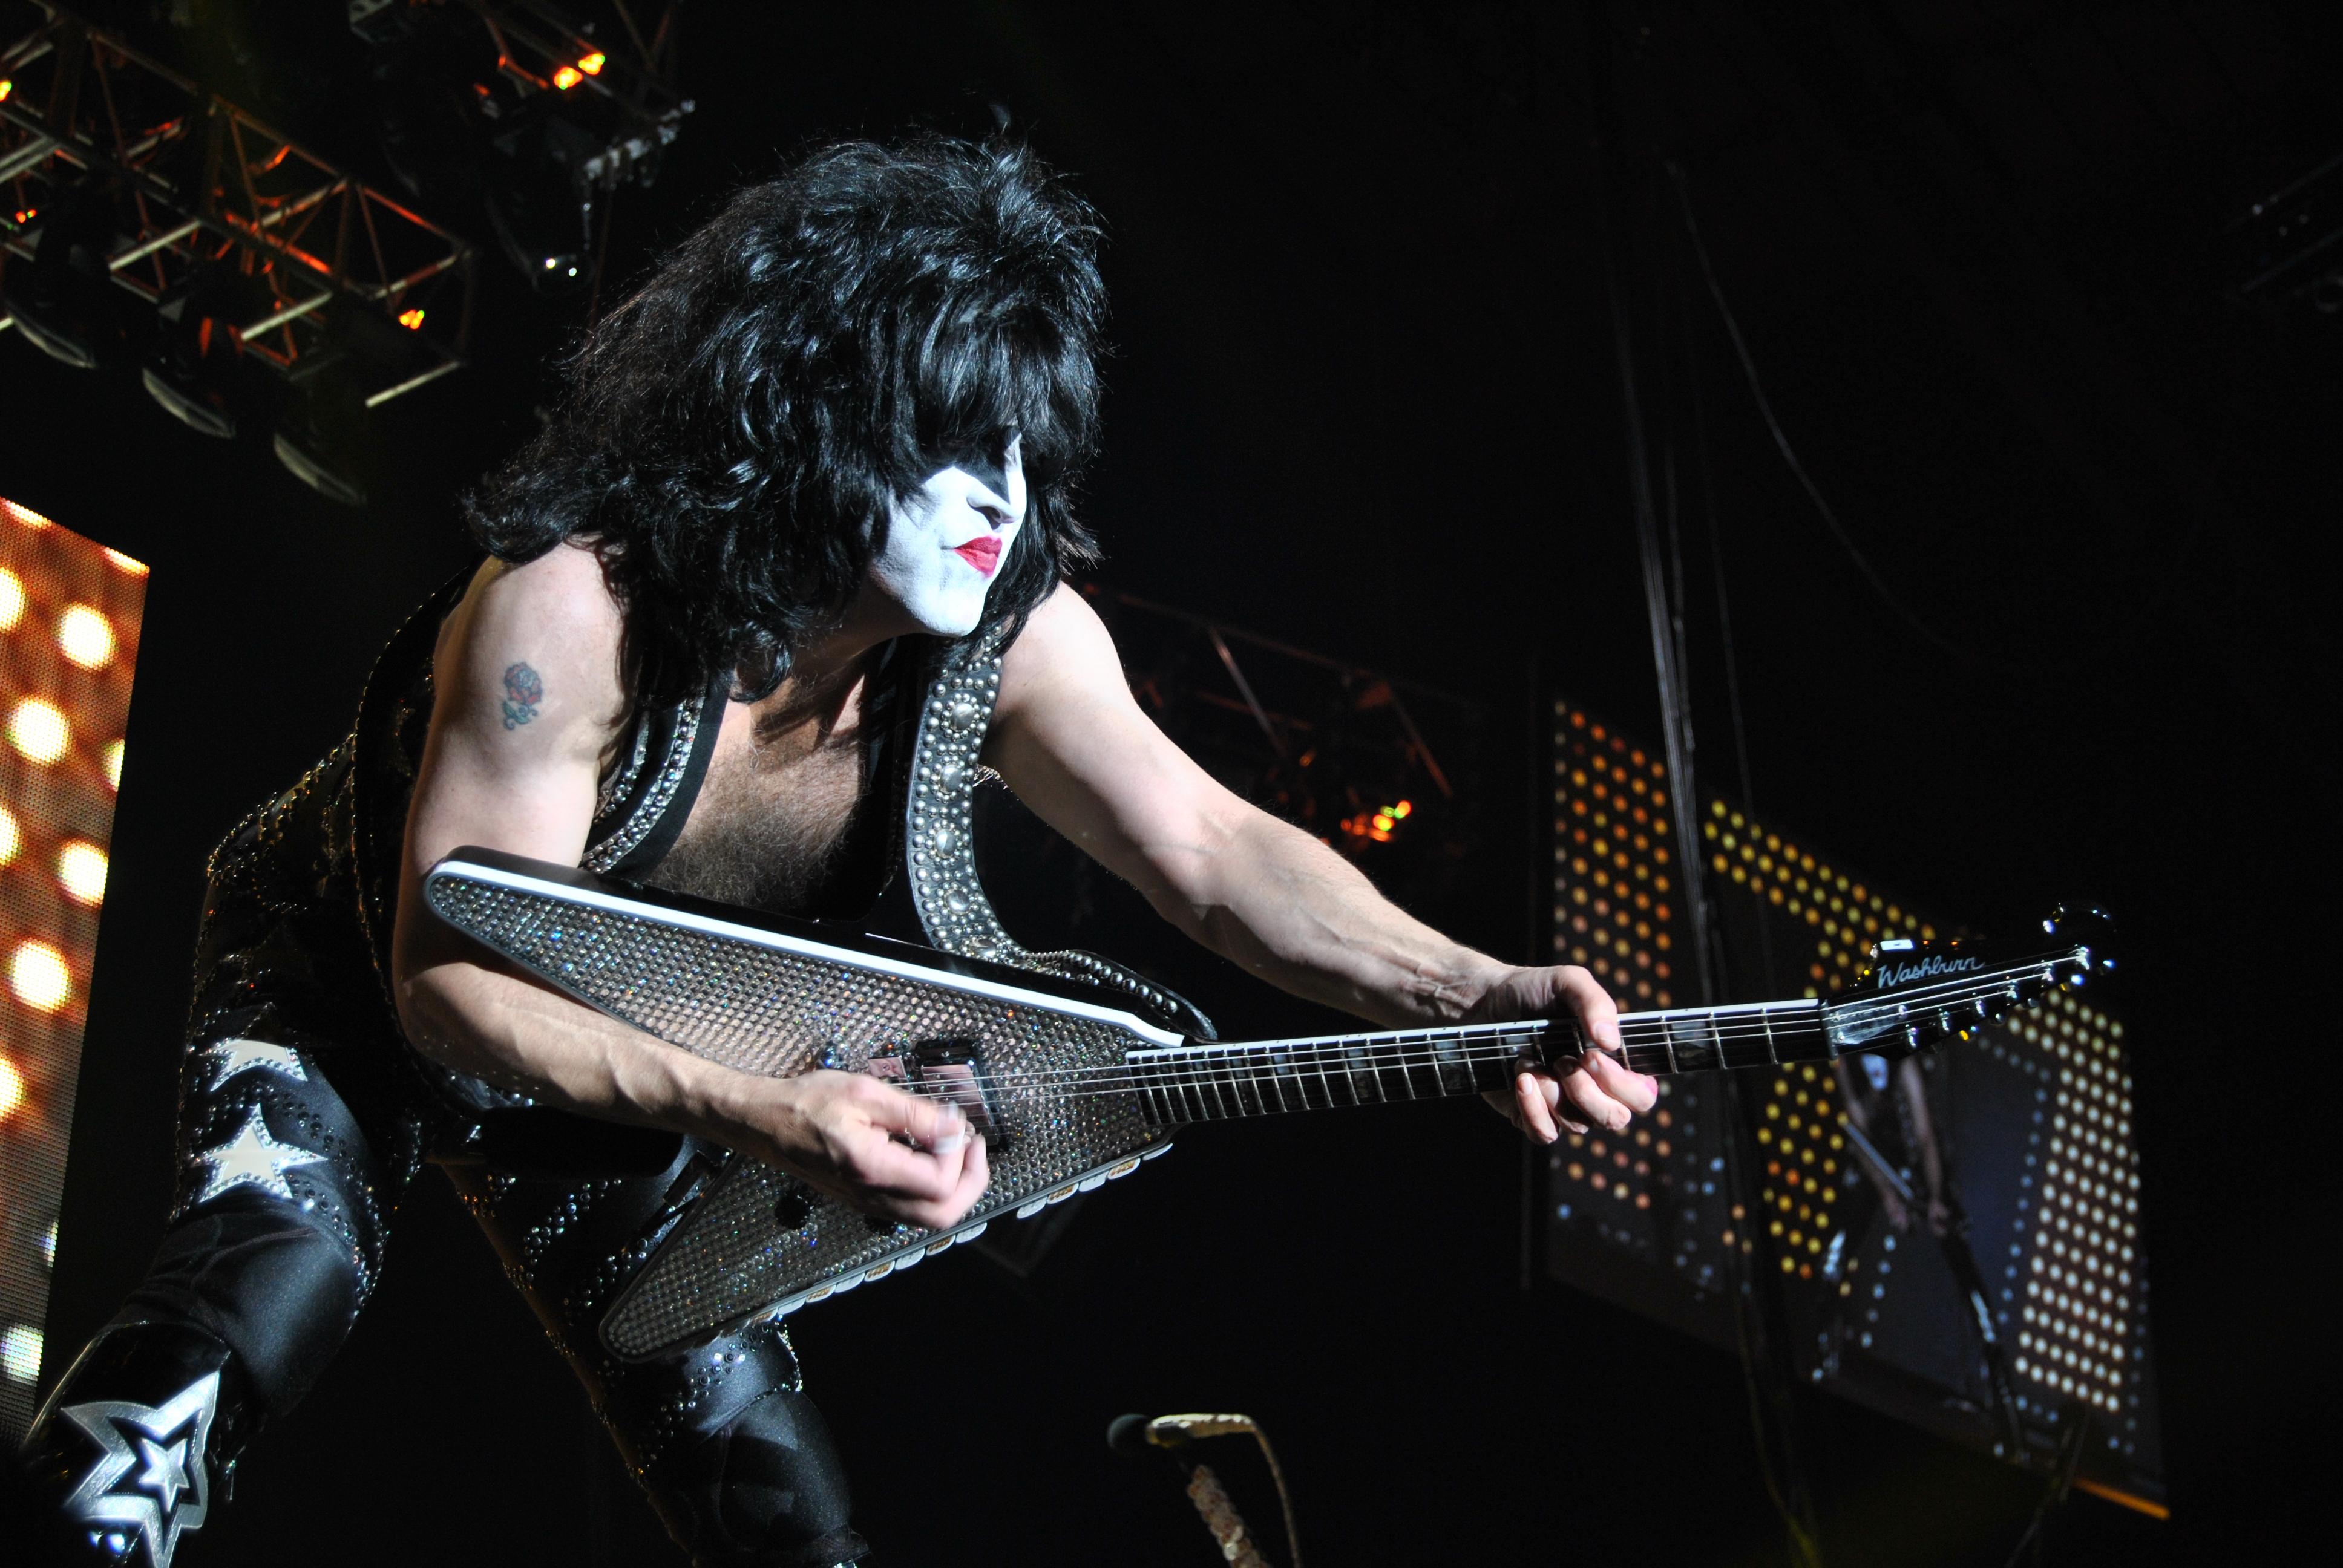 Kiss heavy metal rock bands concert guitar q wallpaper background 3872x2592